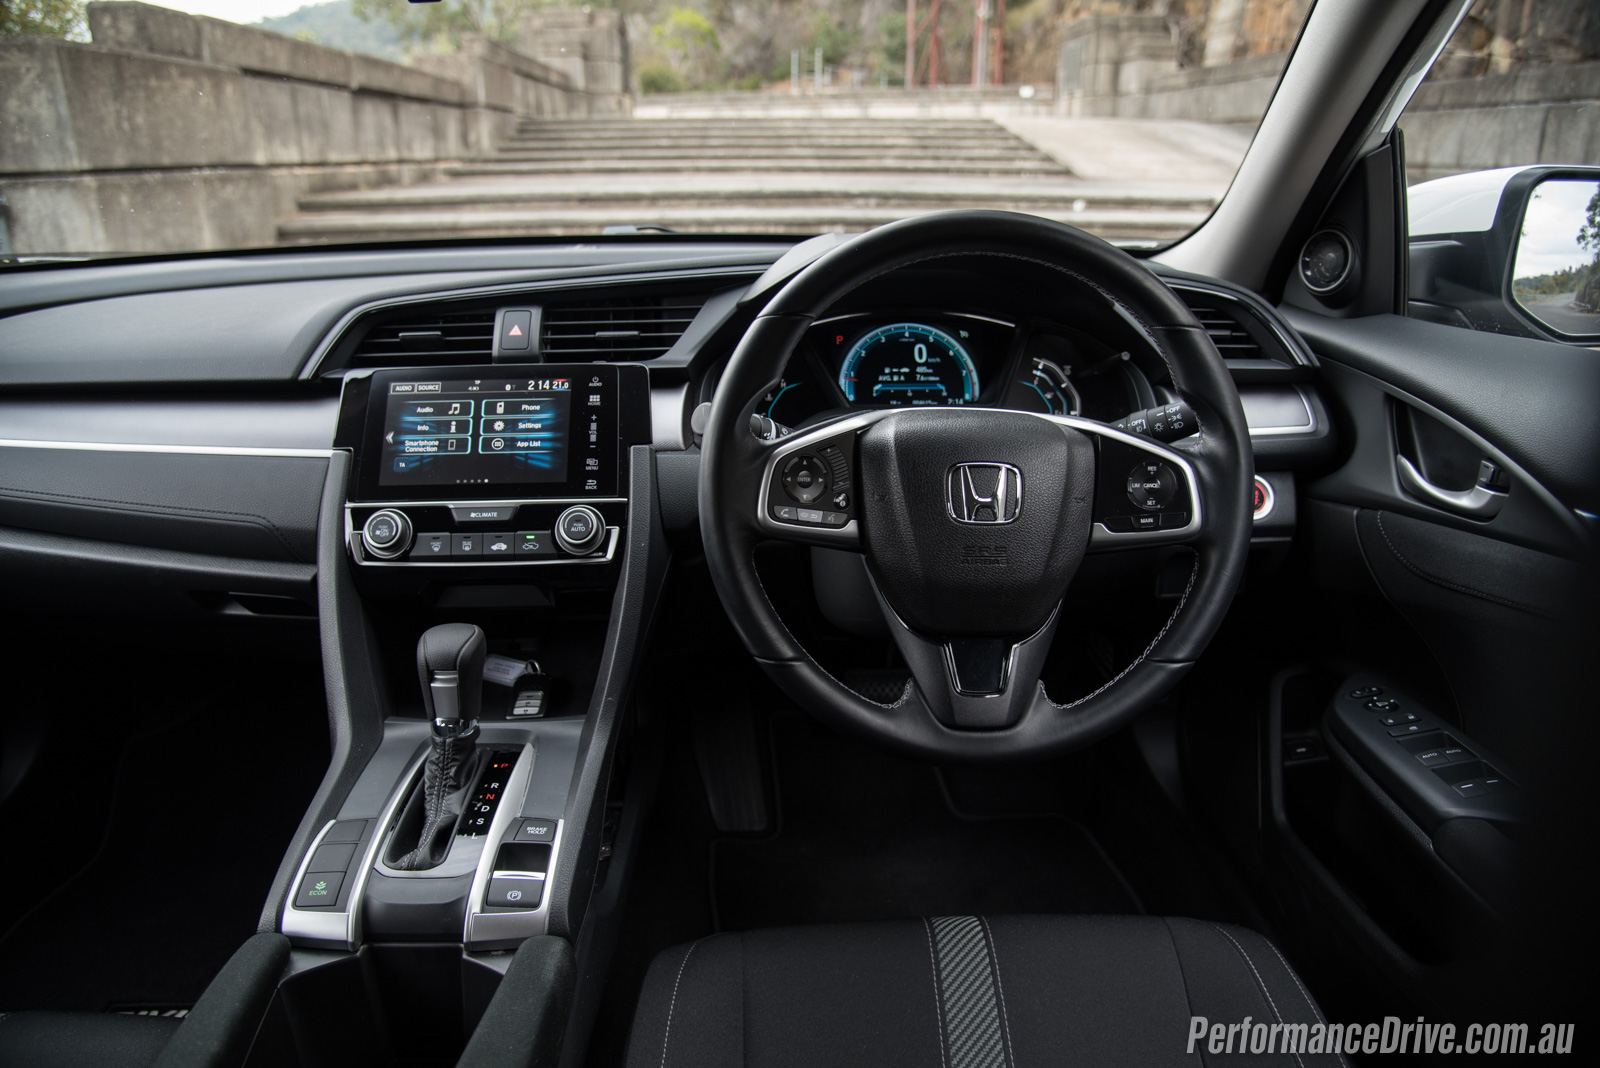 Civic Sedan Interior: 2016 Honda Civic VTi-S Sedan Review (video)